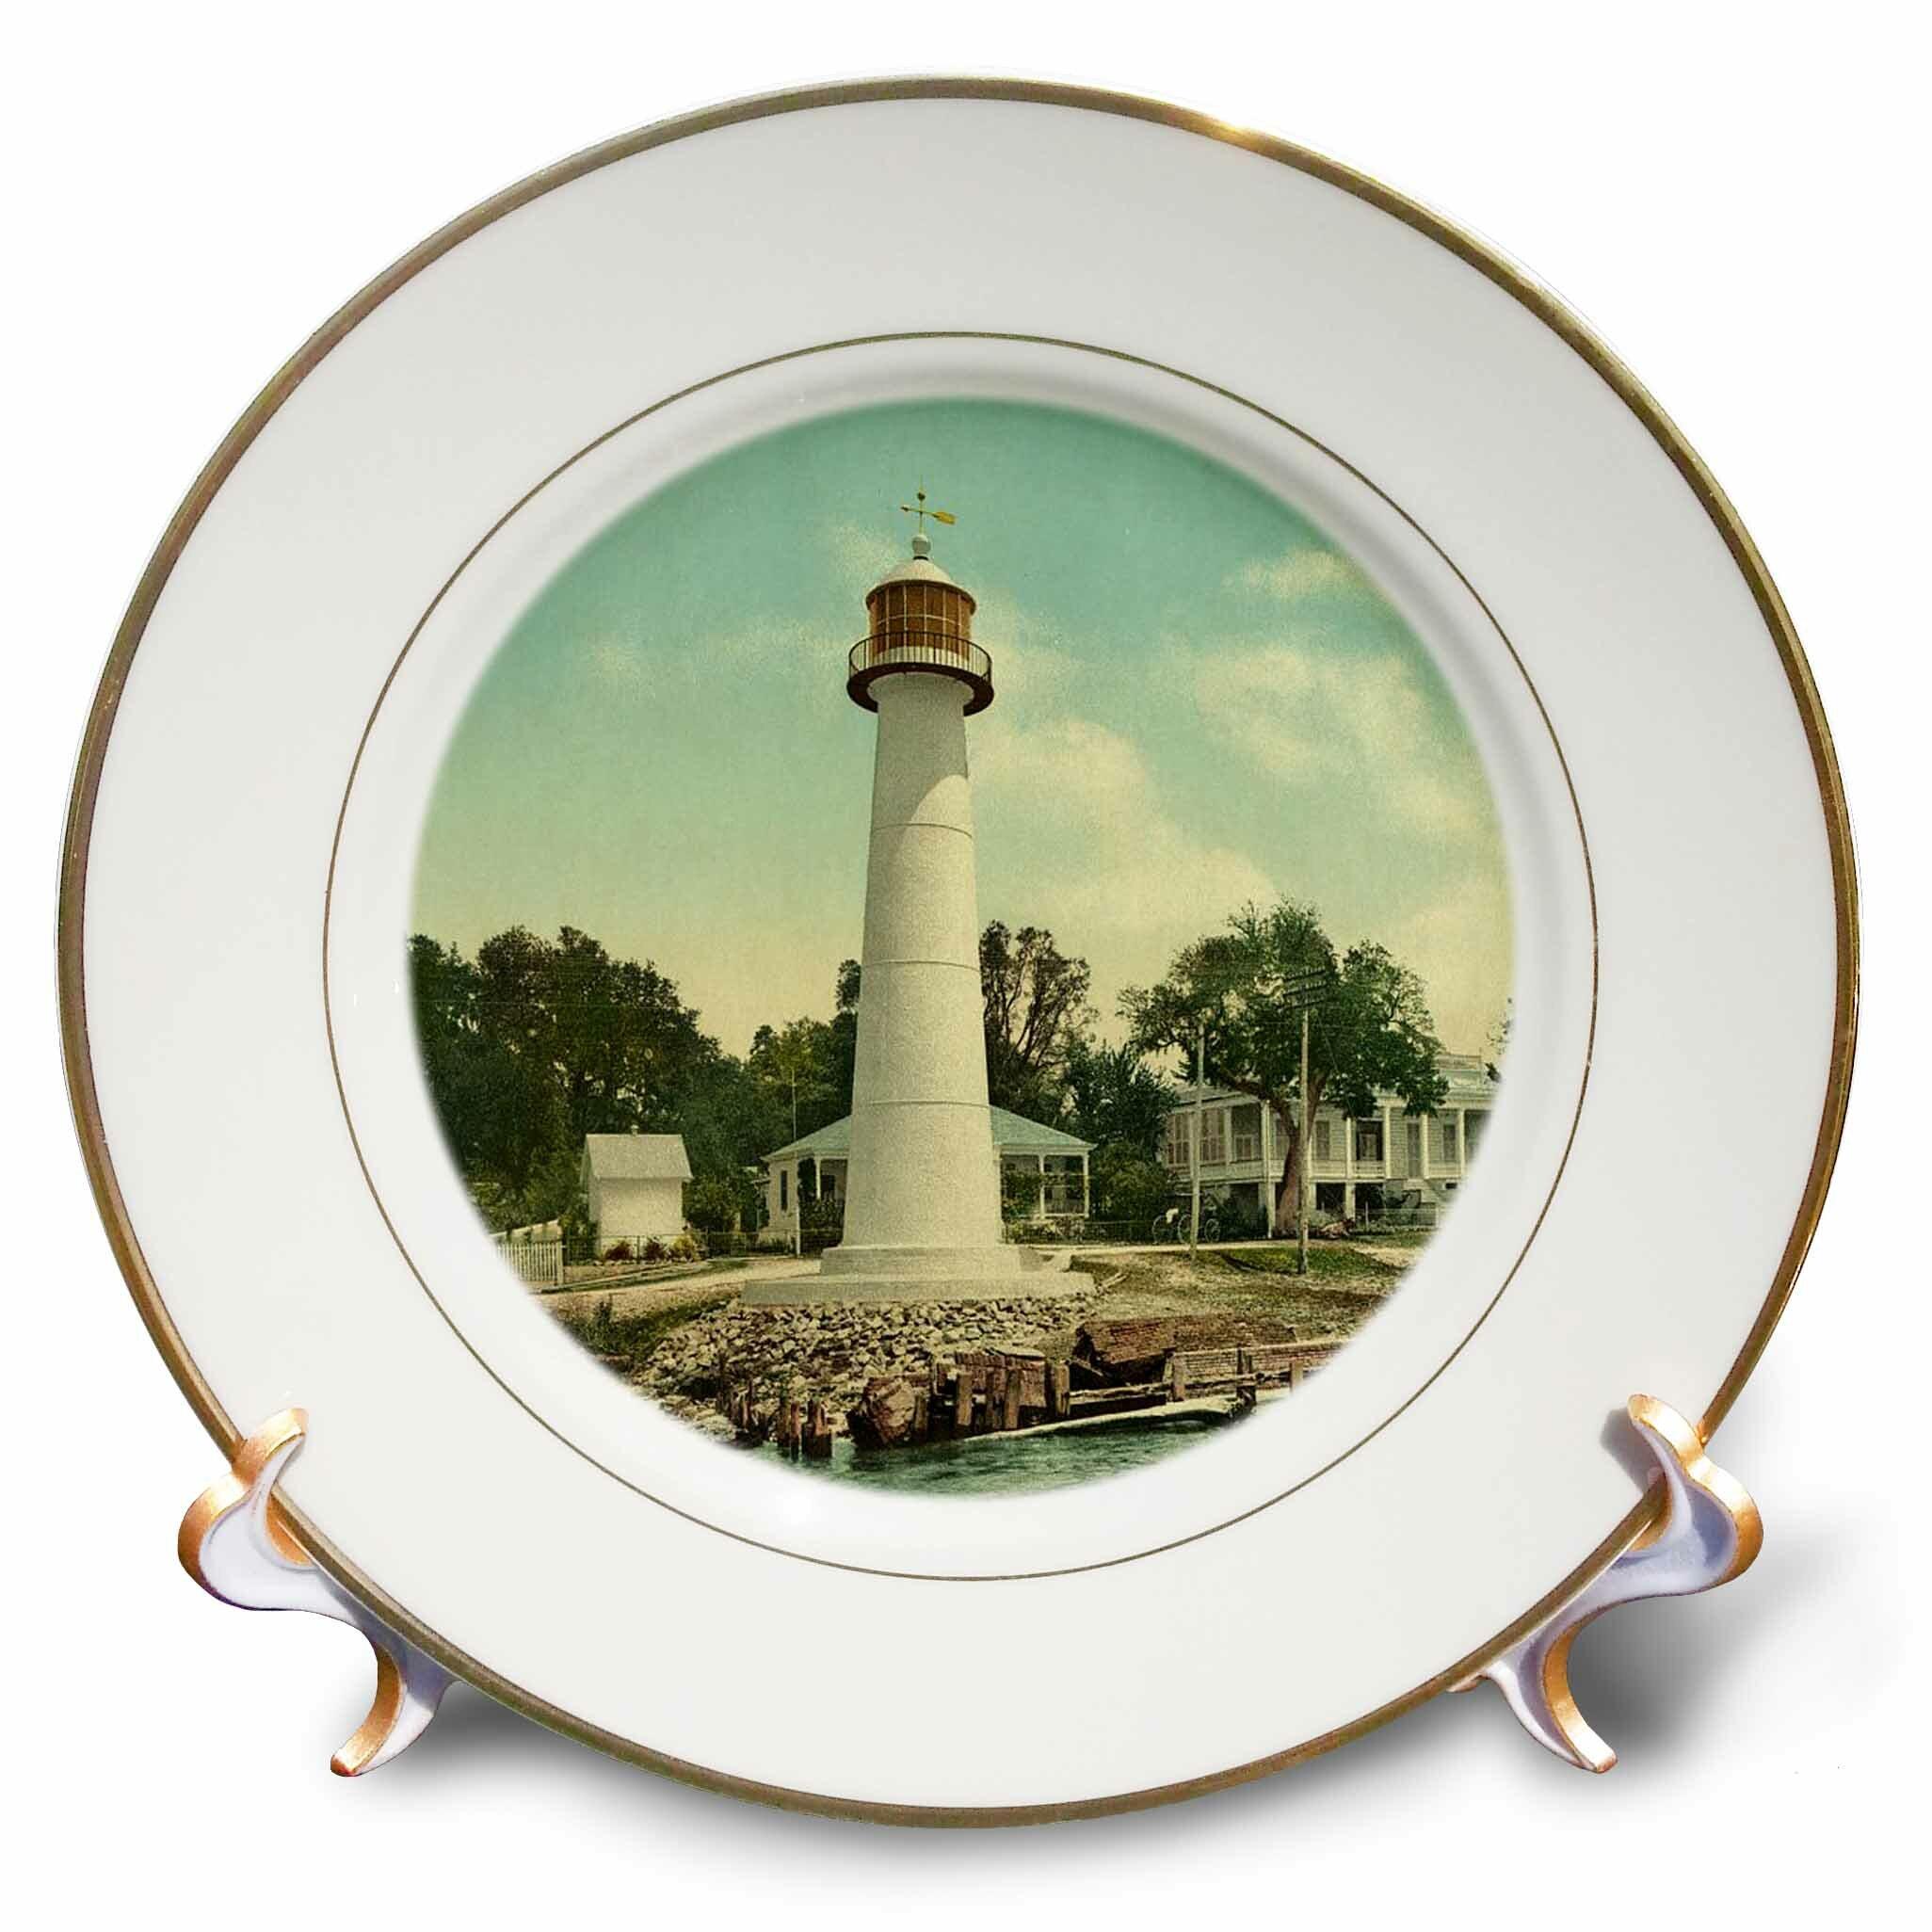 East Urban Home 1901 Biloxi Lighthouse Porcelain Decorative Plate